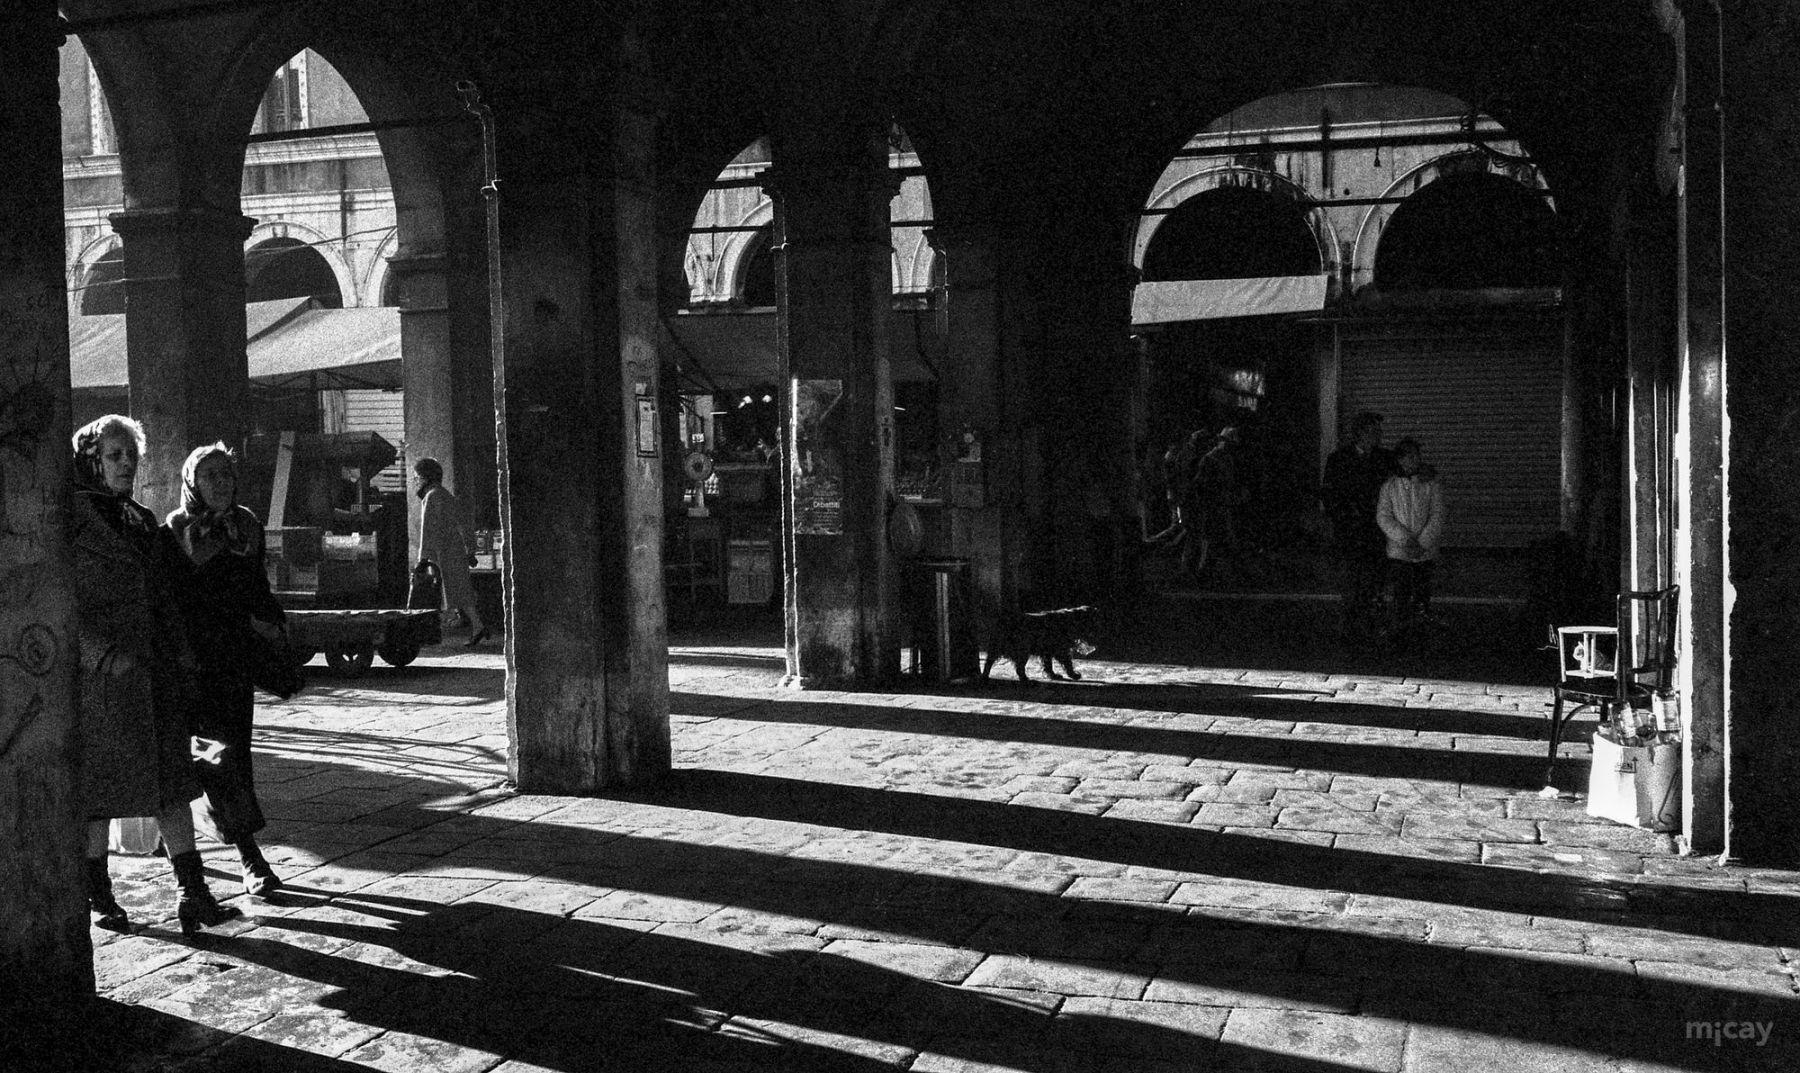 MichelAycaguer-Venise-AquaAlta-Noel-1981-39